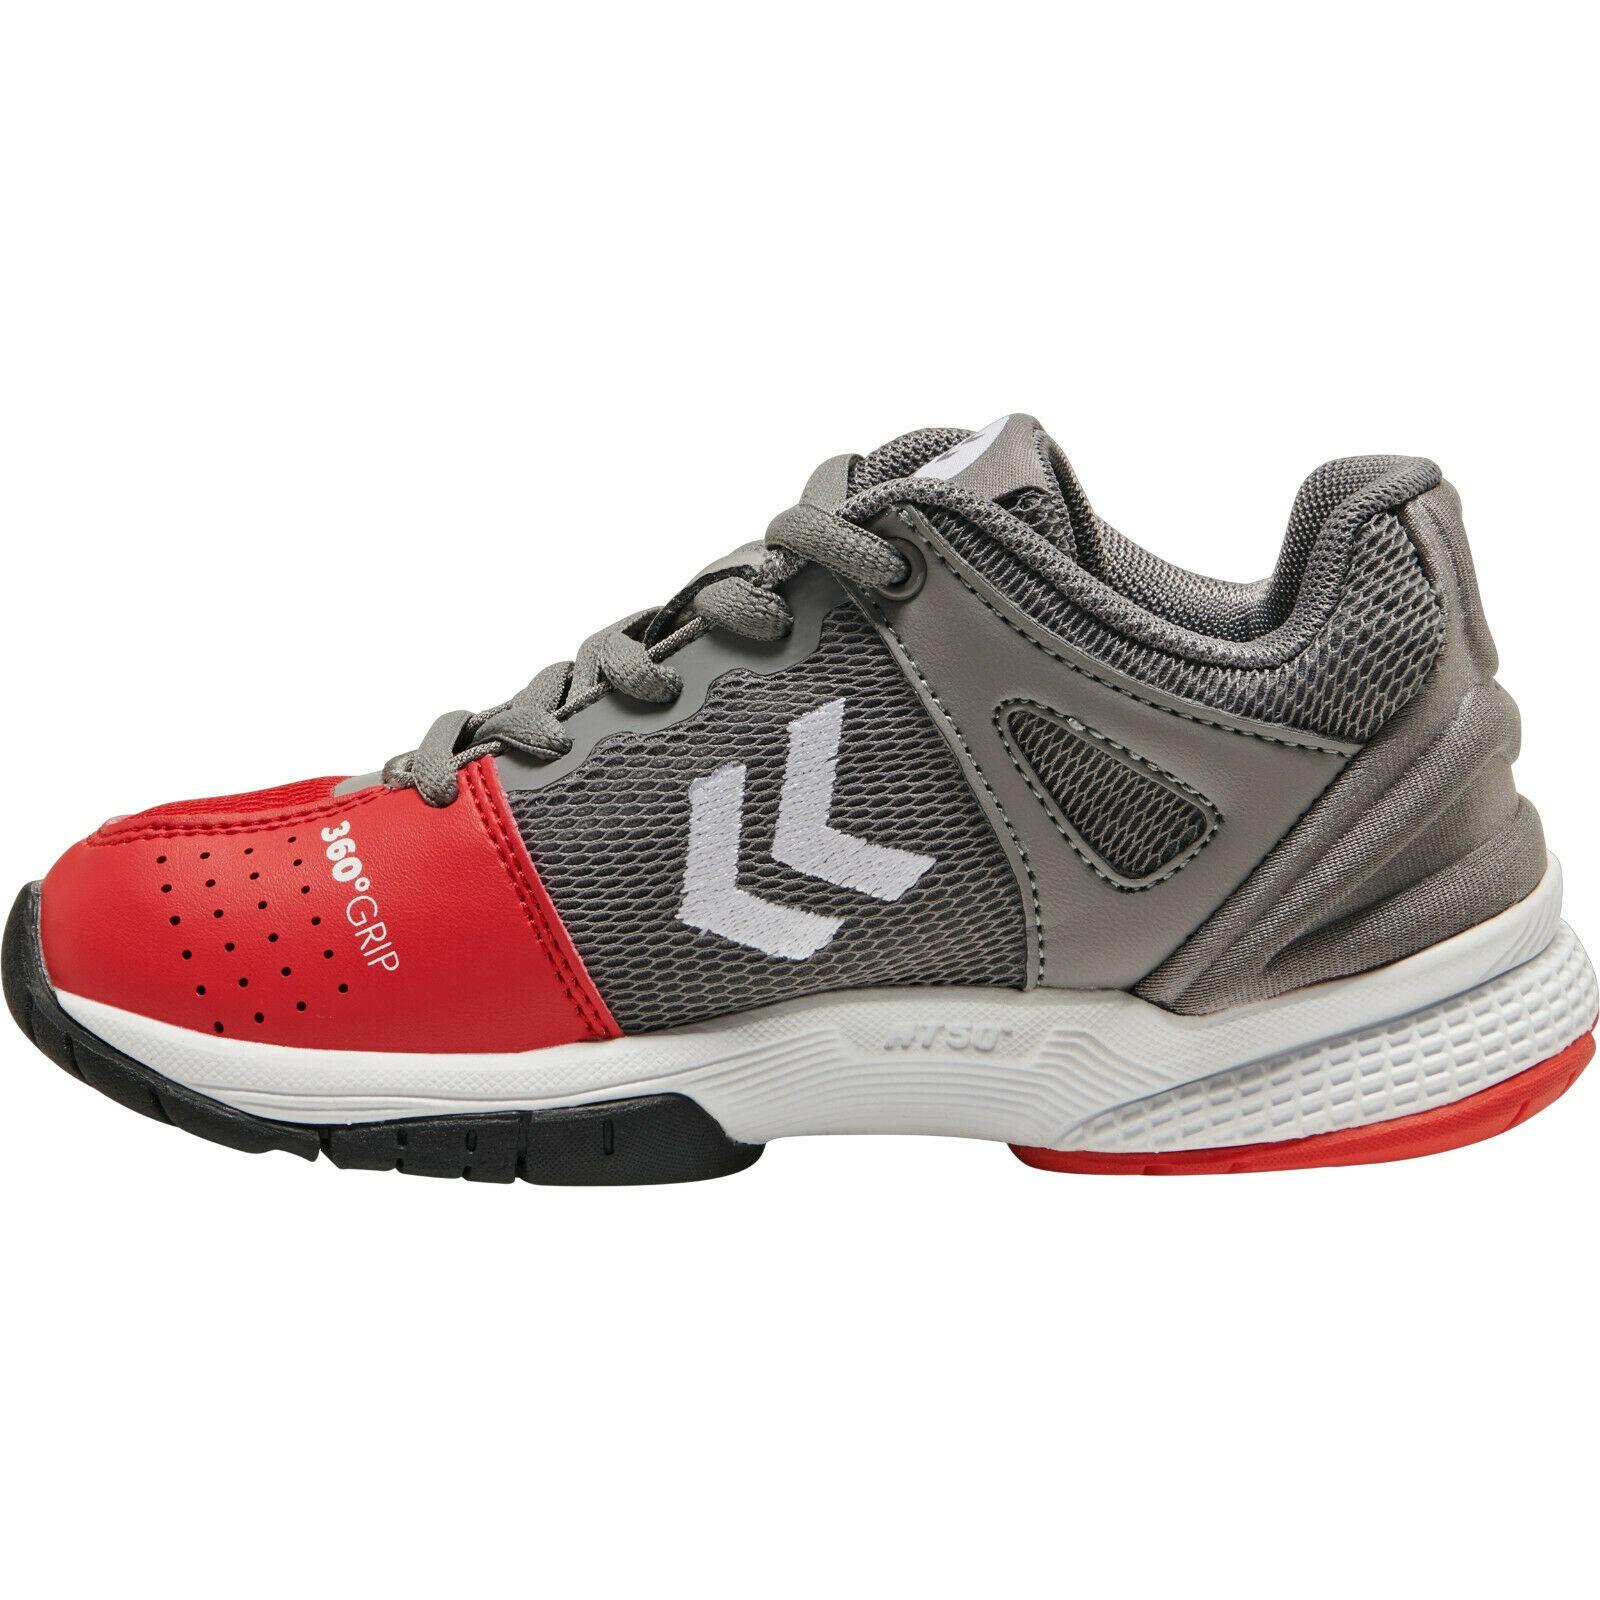 Спортивная обувь Hummel Лето (1308) photo 0